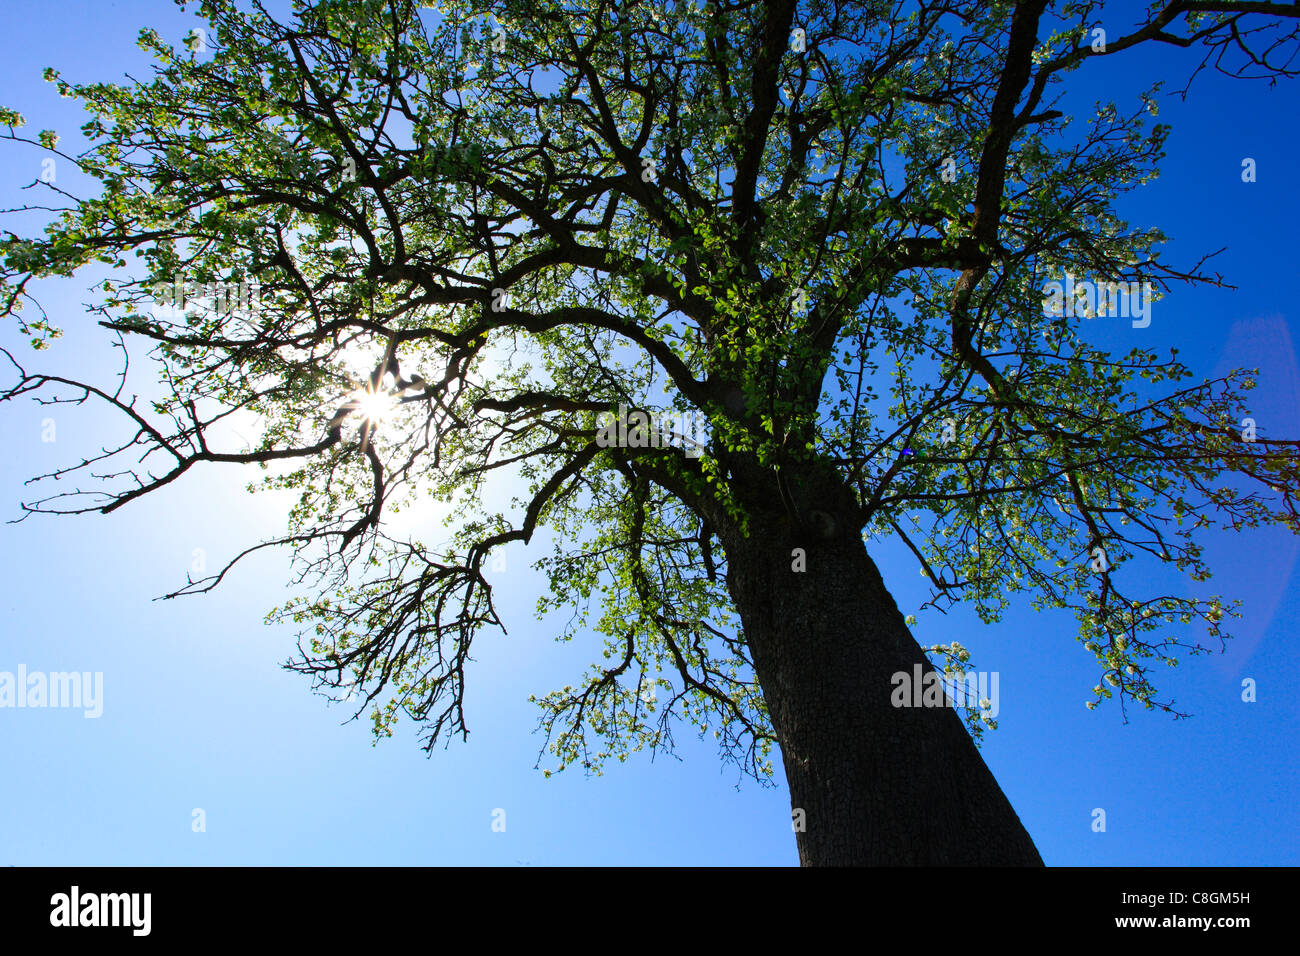 Agrario, Apple, Apple Tree, albero apple blossom, fiorire, albero, blossom, fiorire, fiore, splendore, dettaglio, Immagini Stock